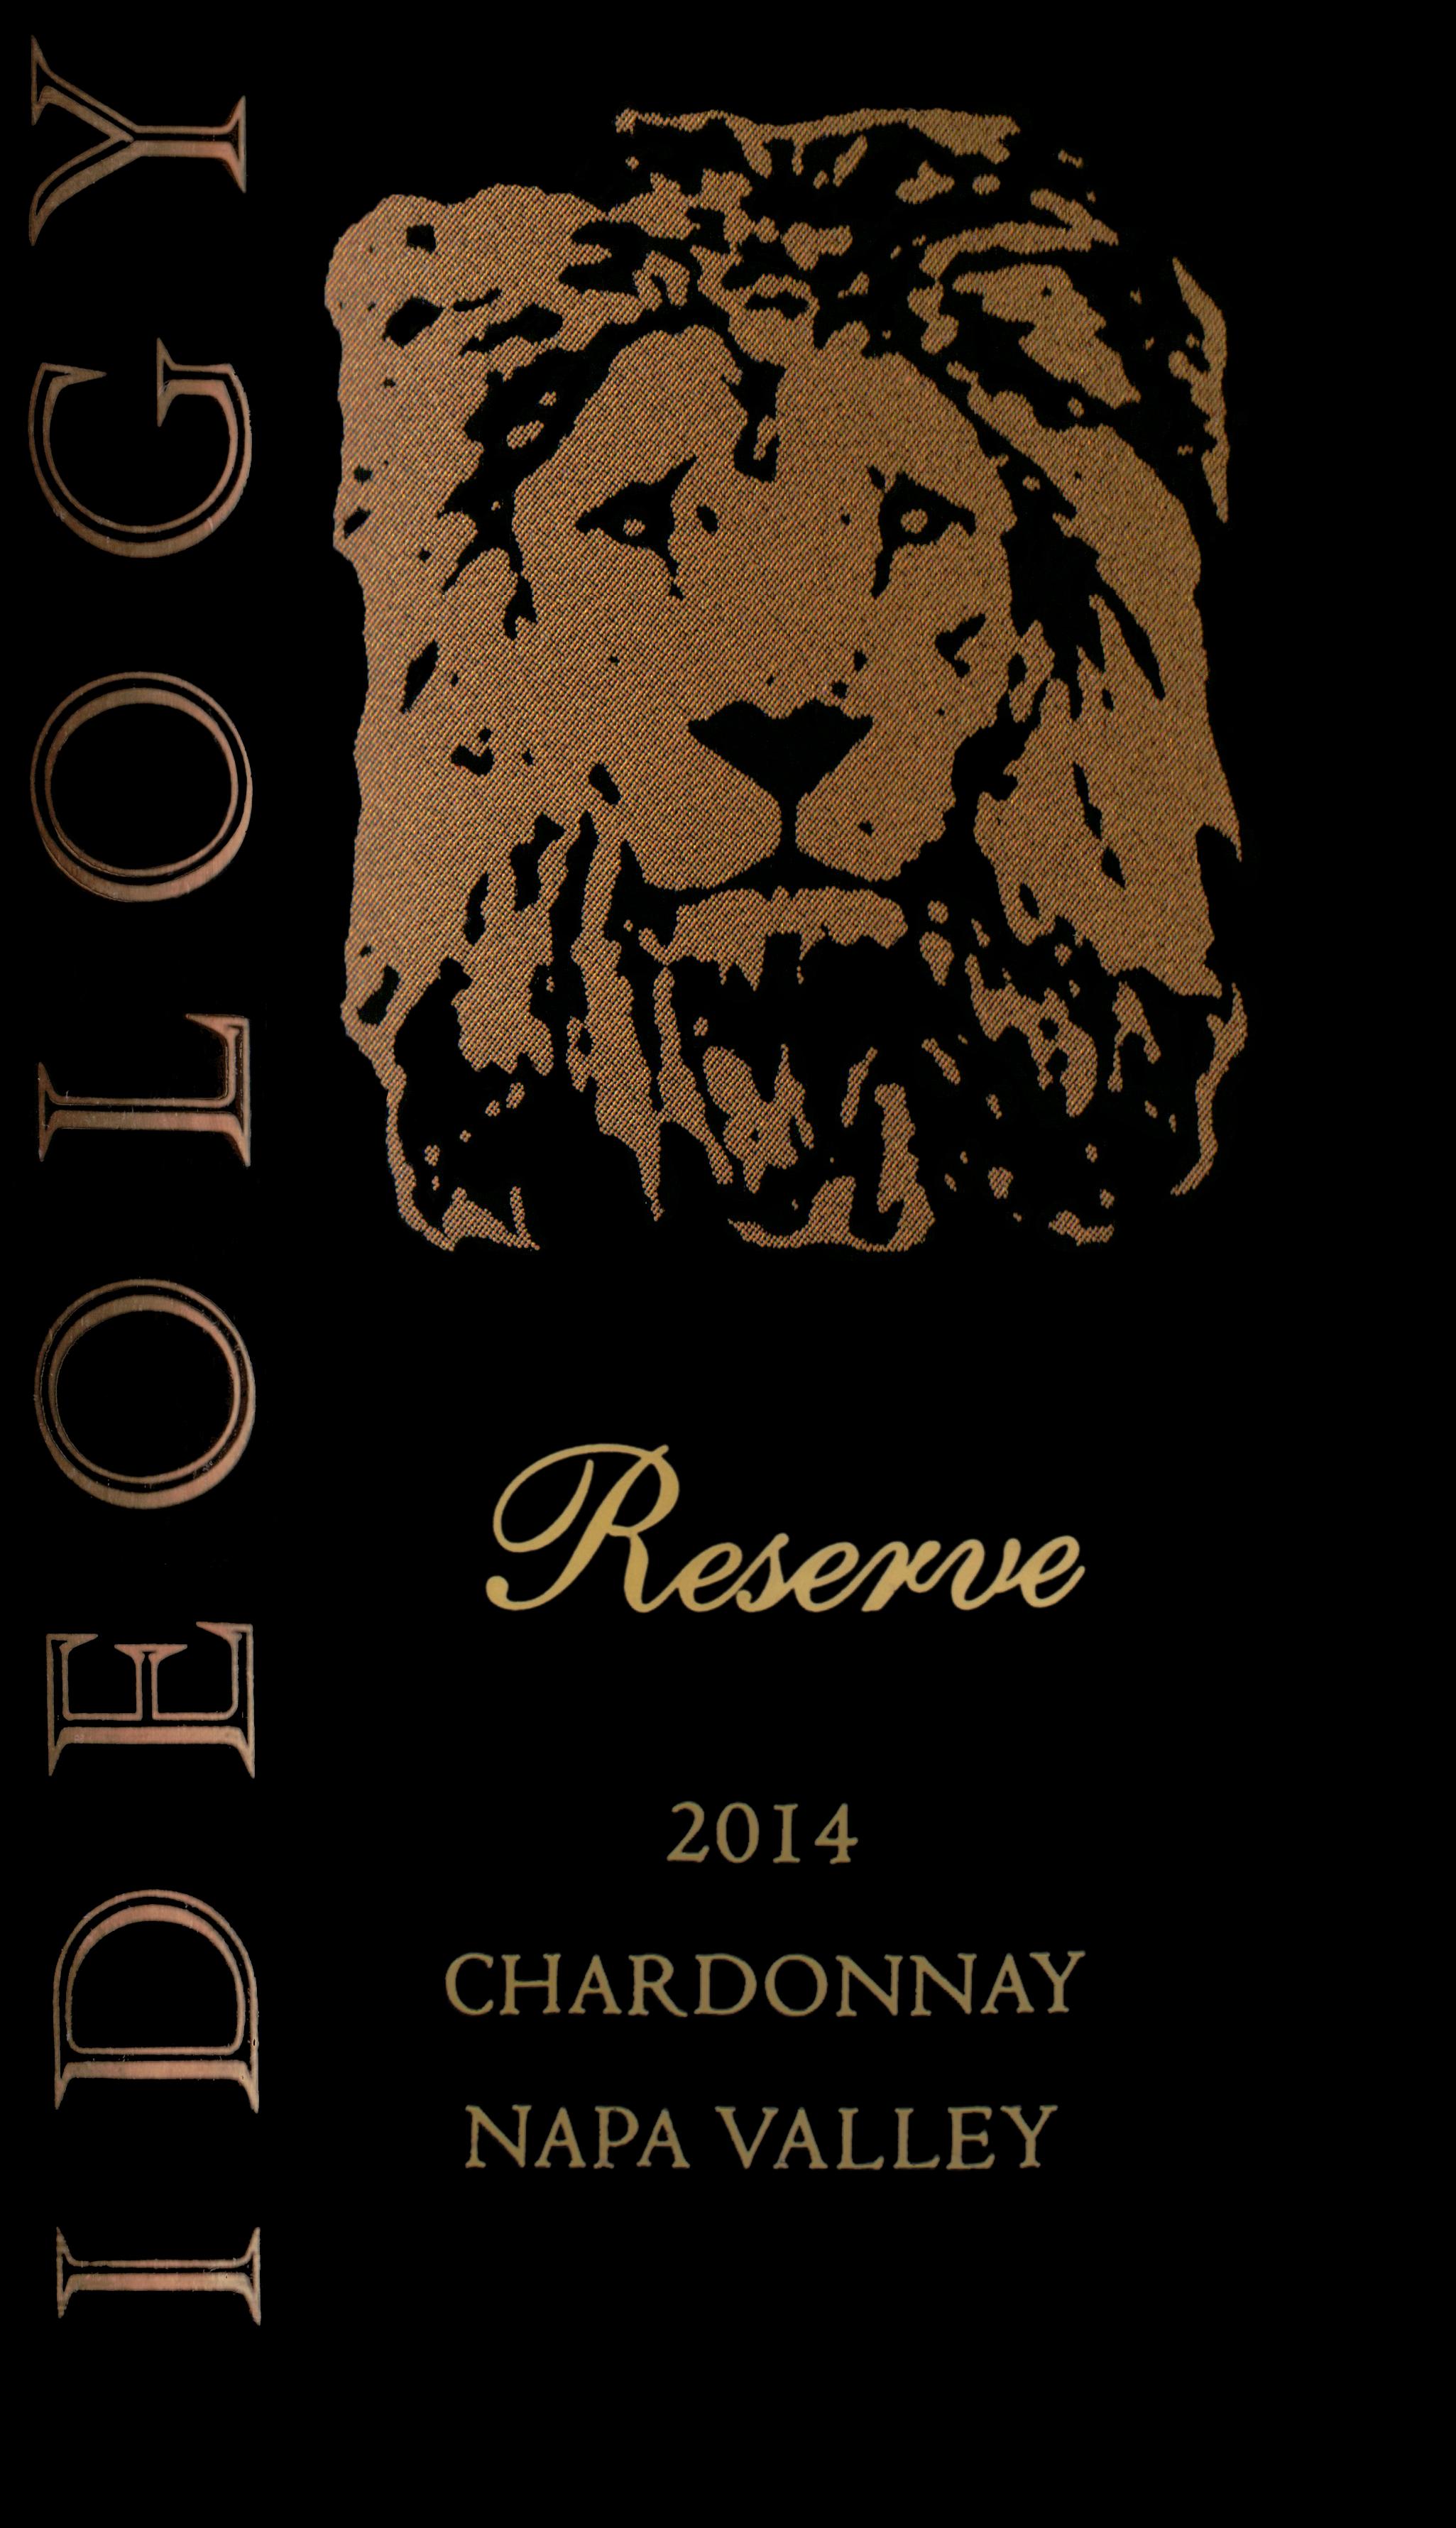 Ideology Reserve Napa Valley Chardonnay 2014